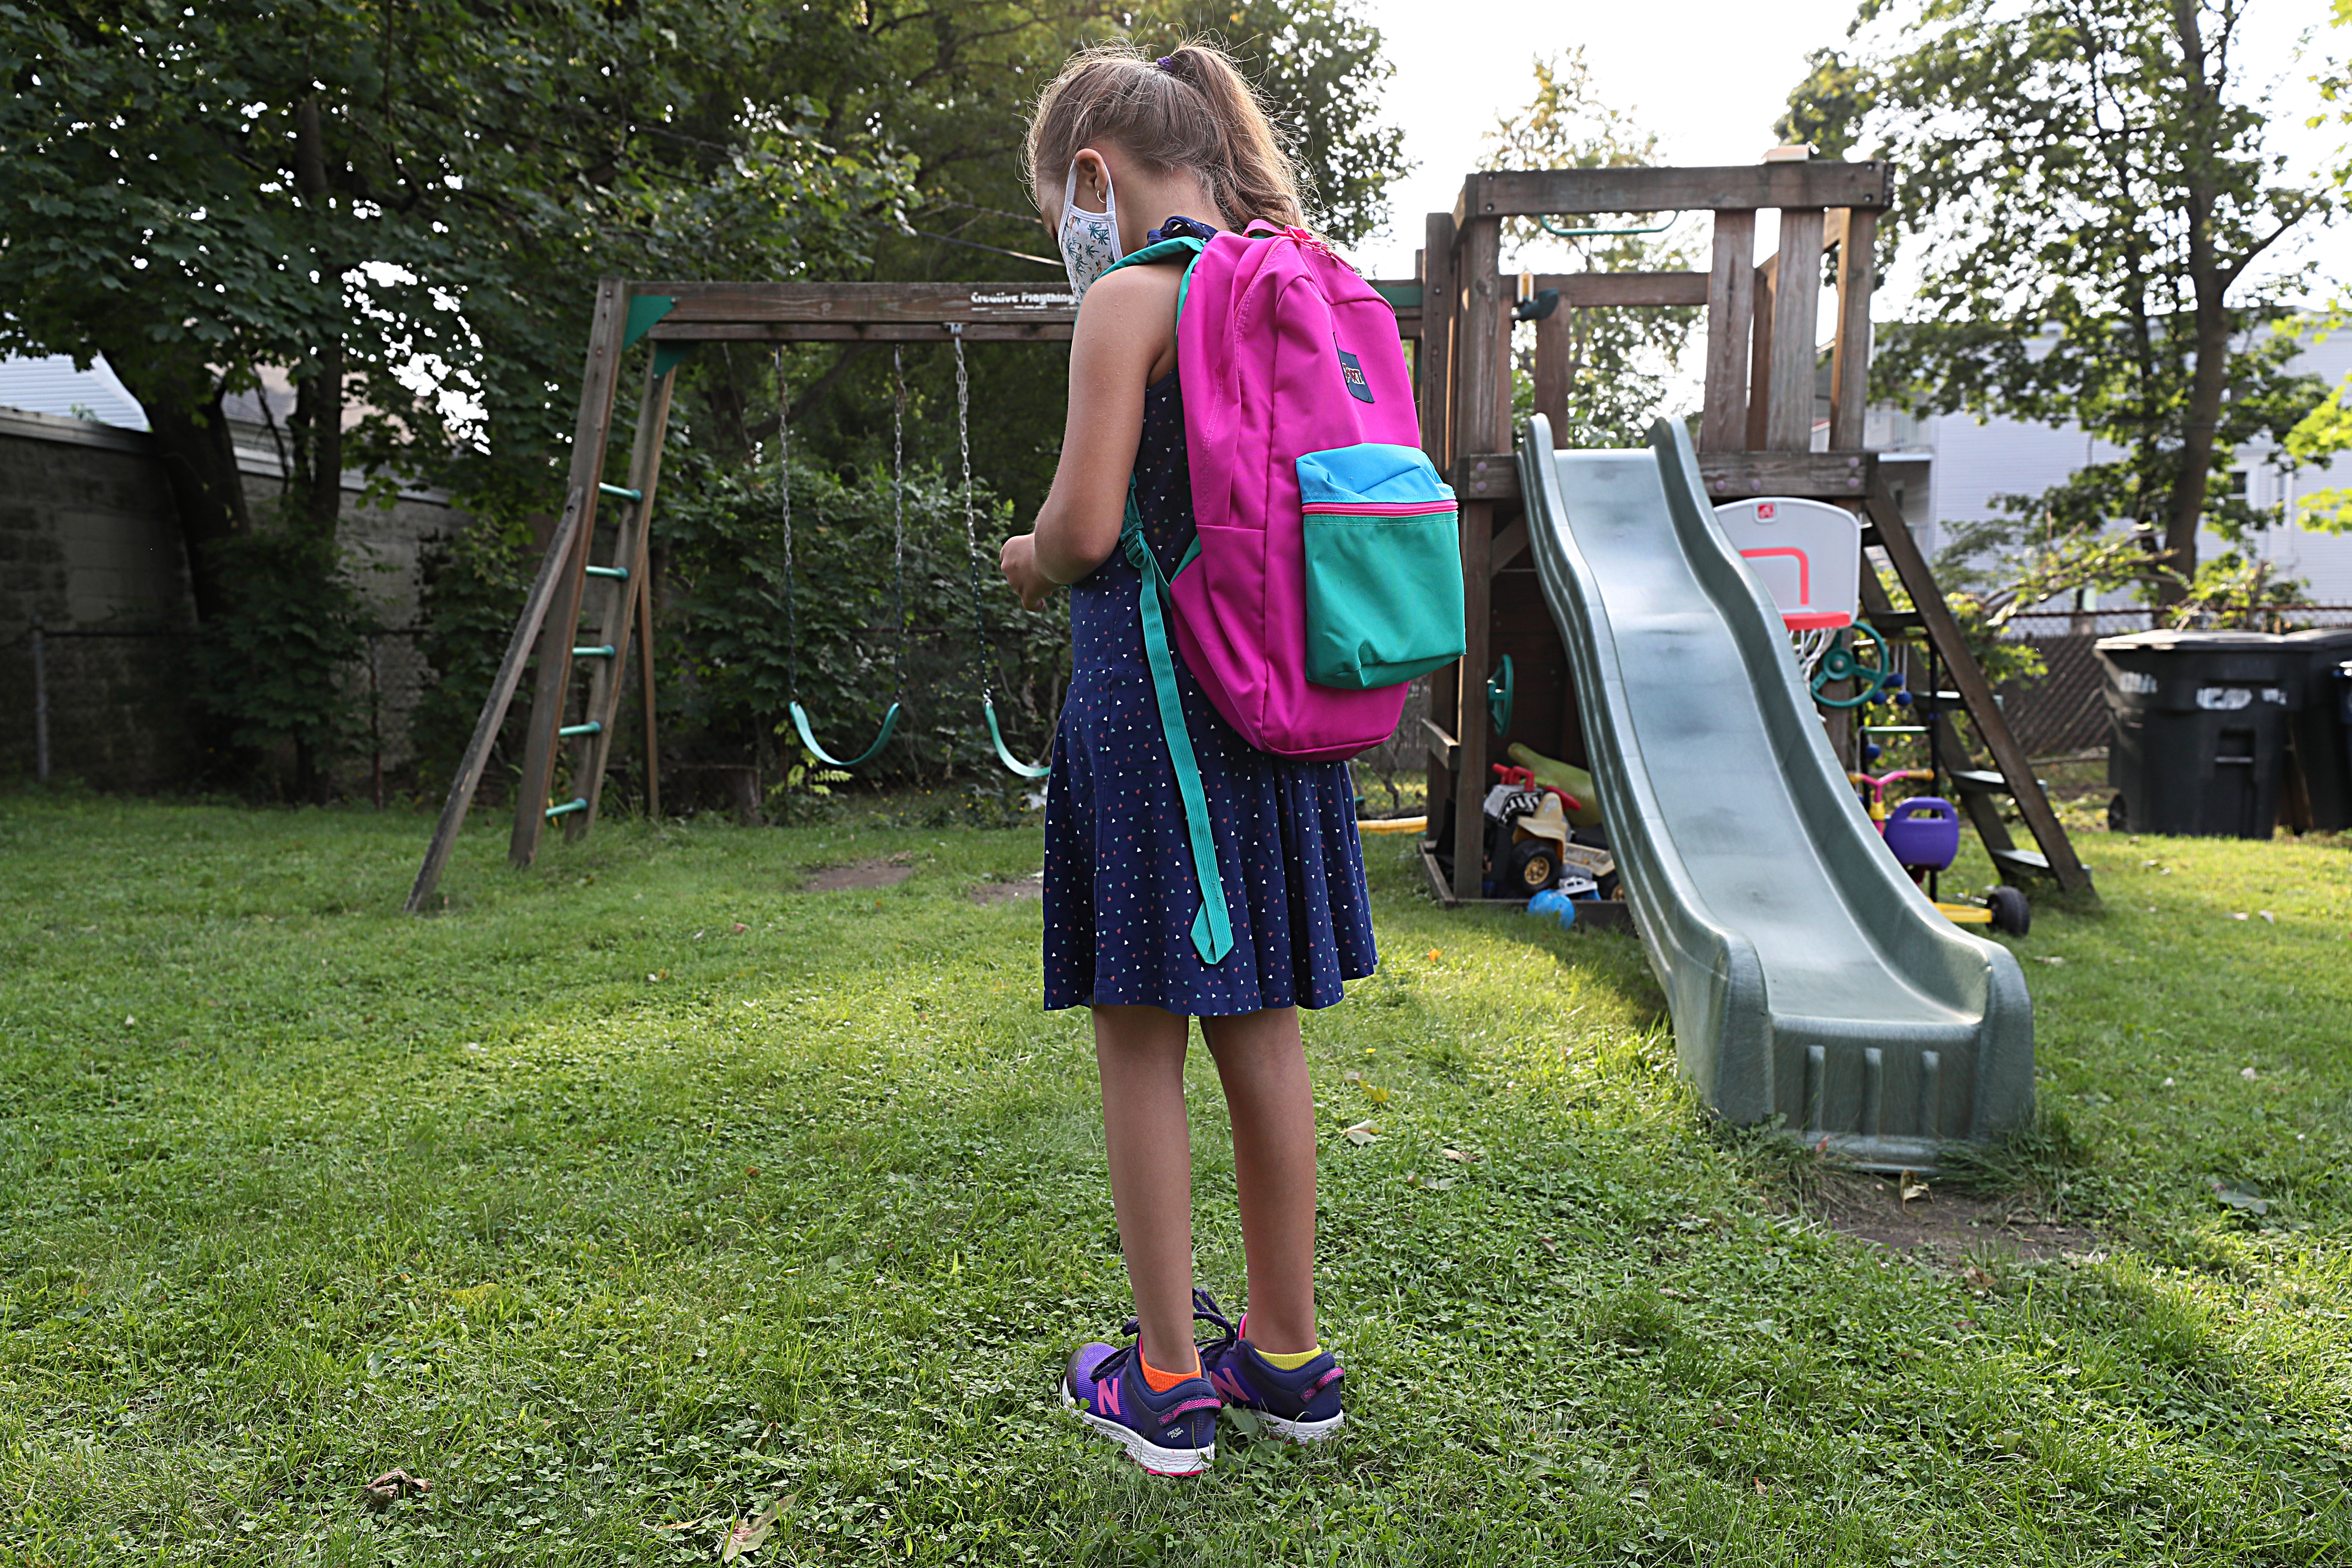 Lulu, 9, wears her back-to-school backpack in her backyard, but not yet to her school.